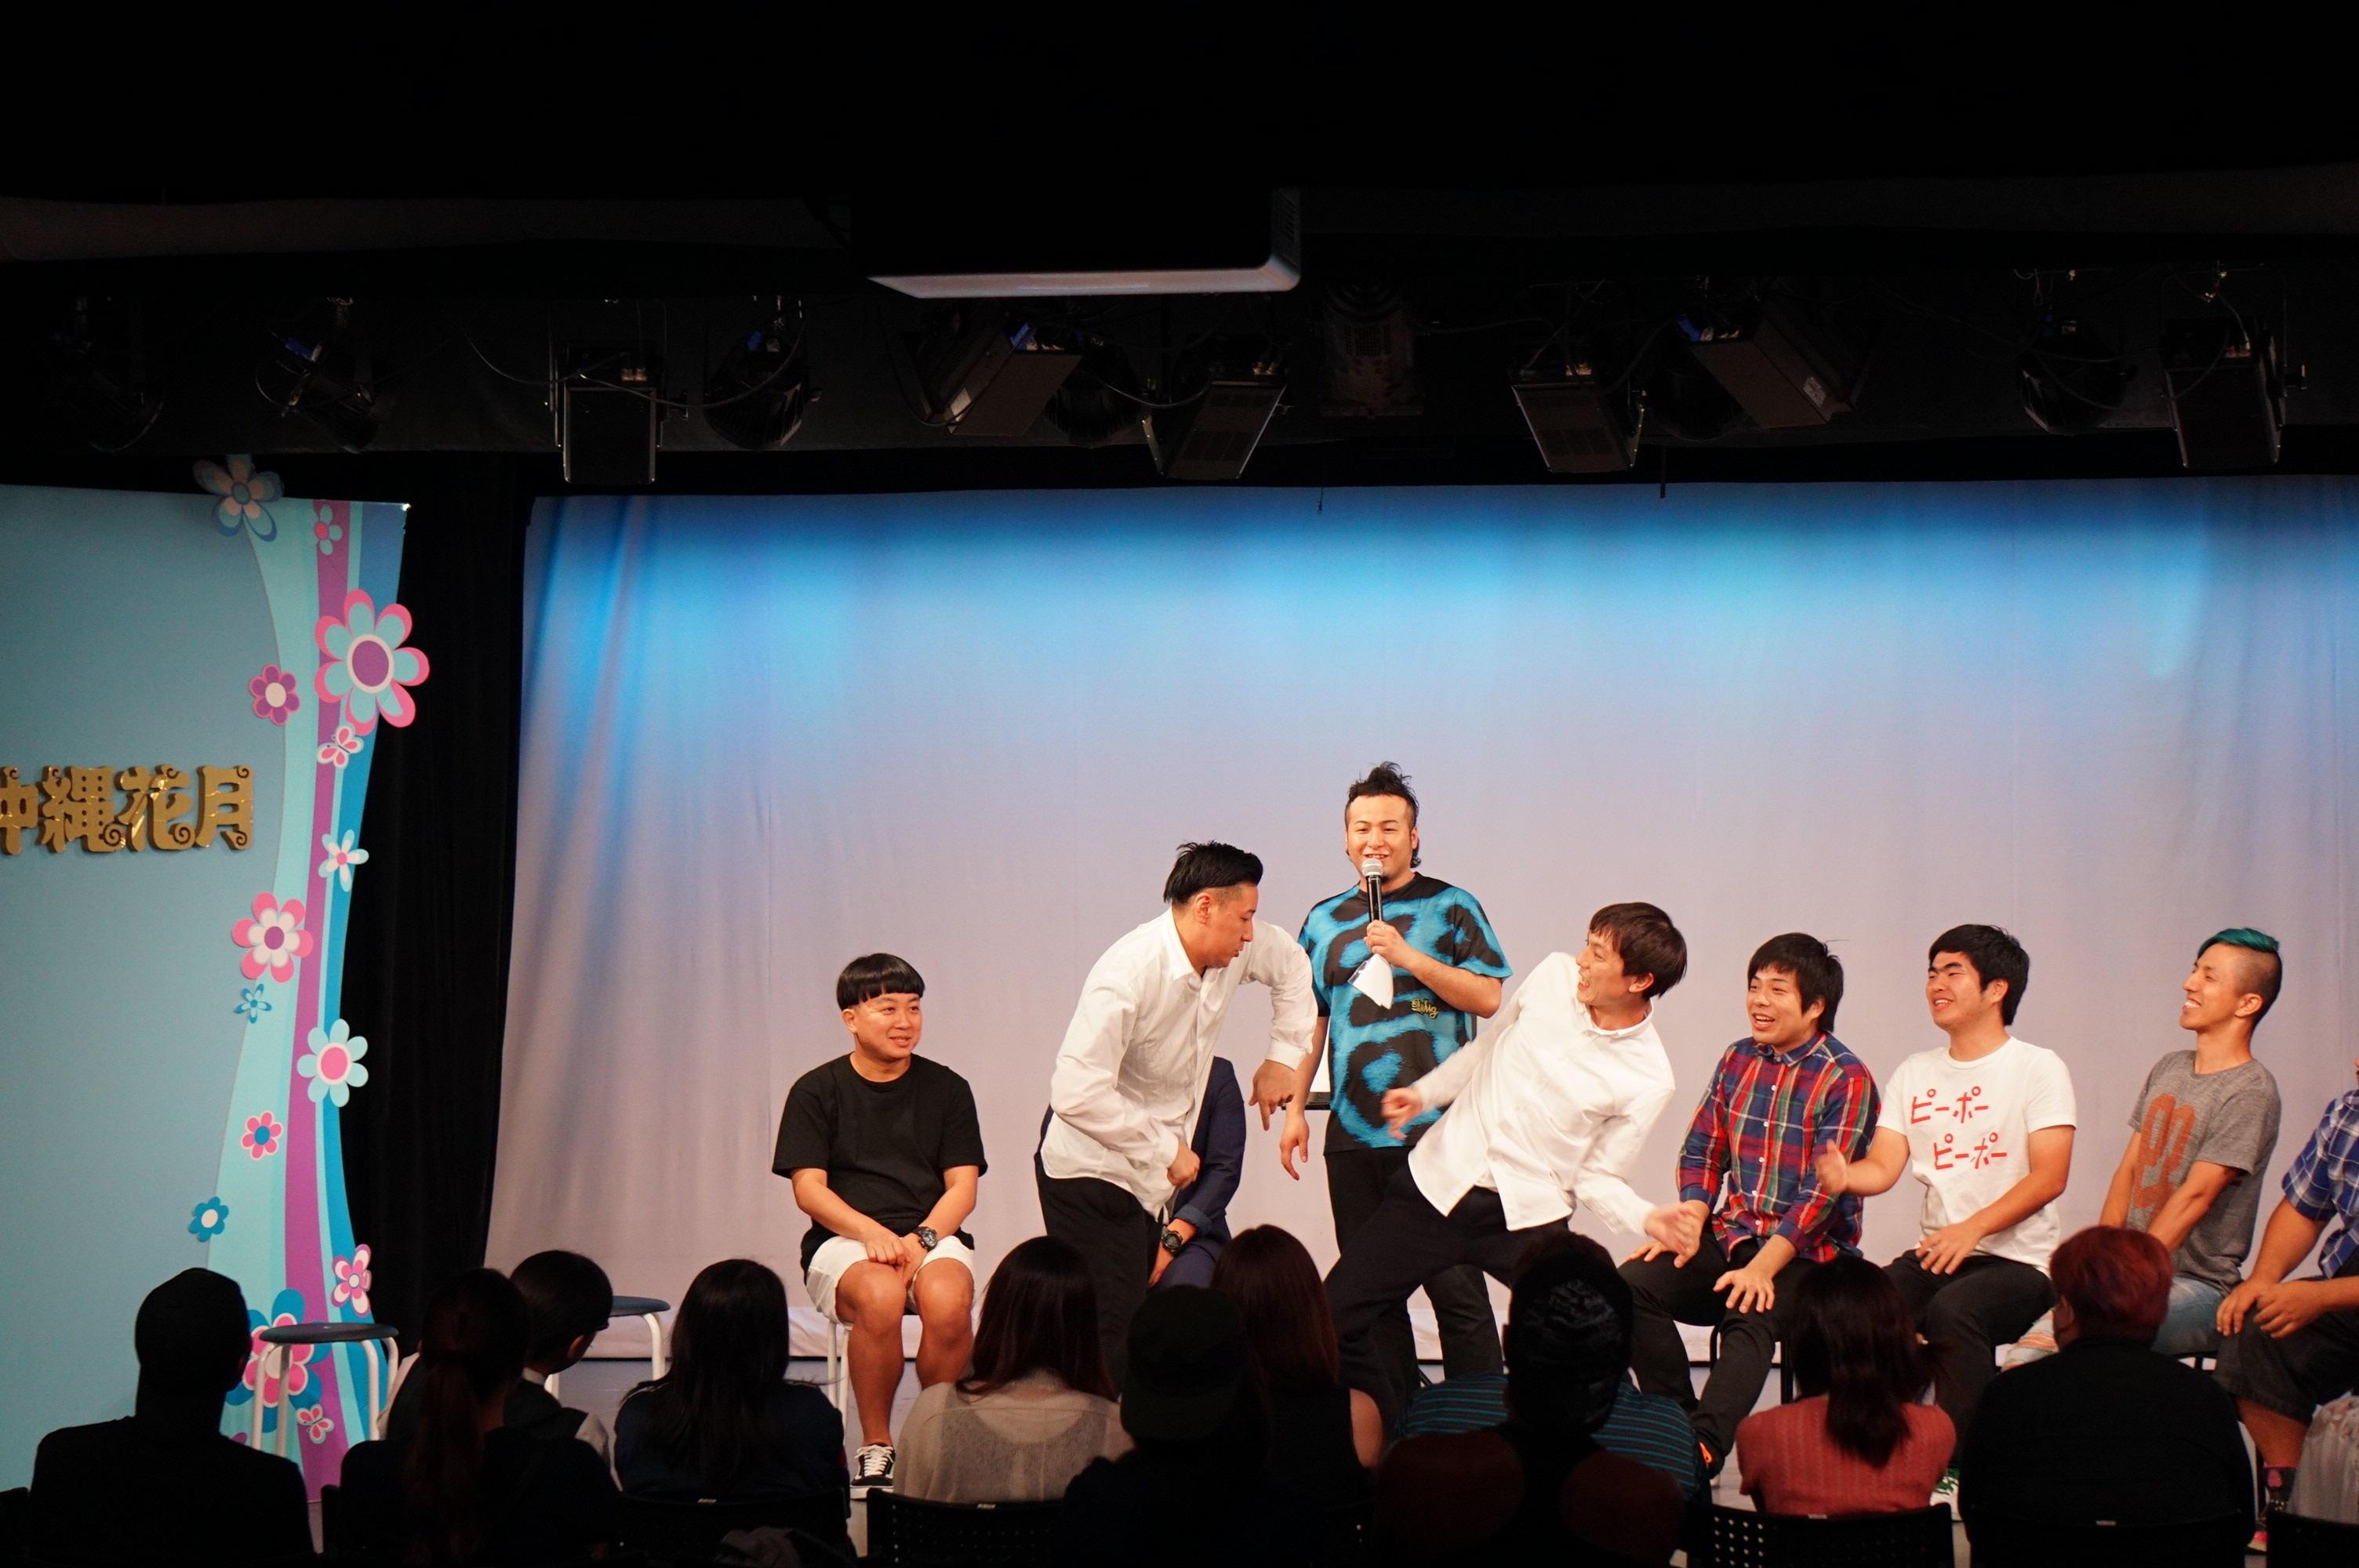 http://news.yoshimoto.co.jp/20160526174609-3f035d9b0e4406232f346a49668298ec6224a6d7.jpg